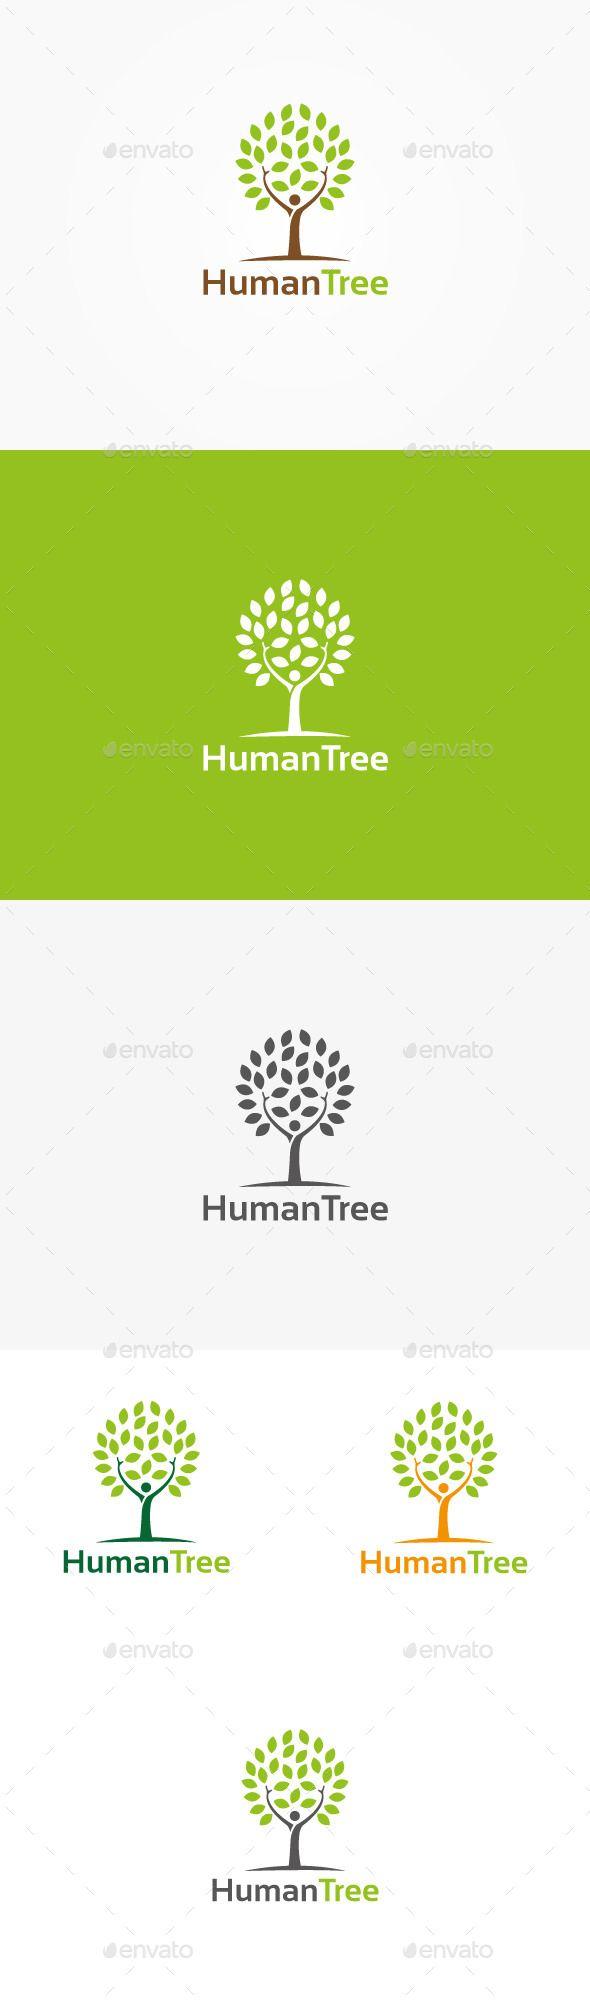 Tree logo design ideas